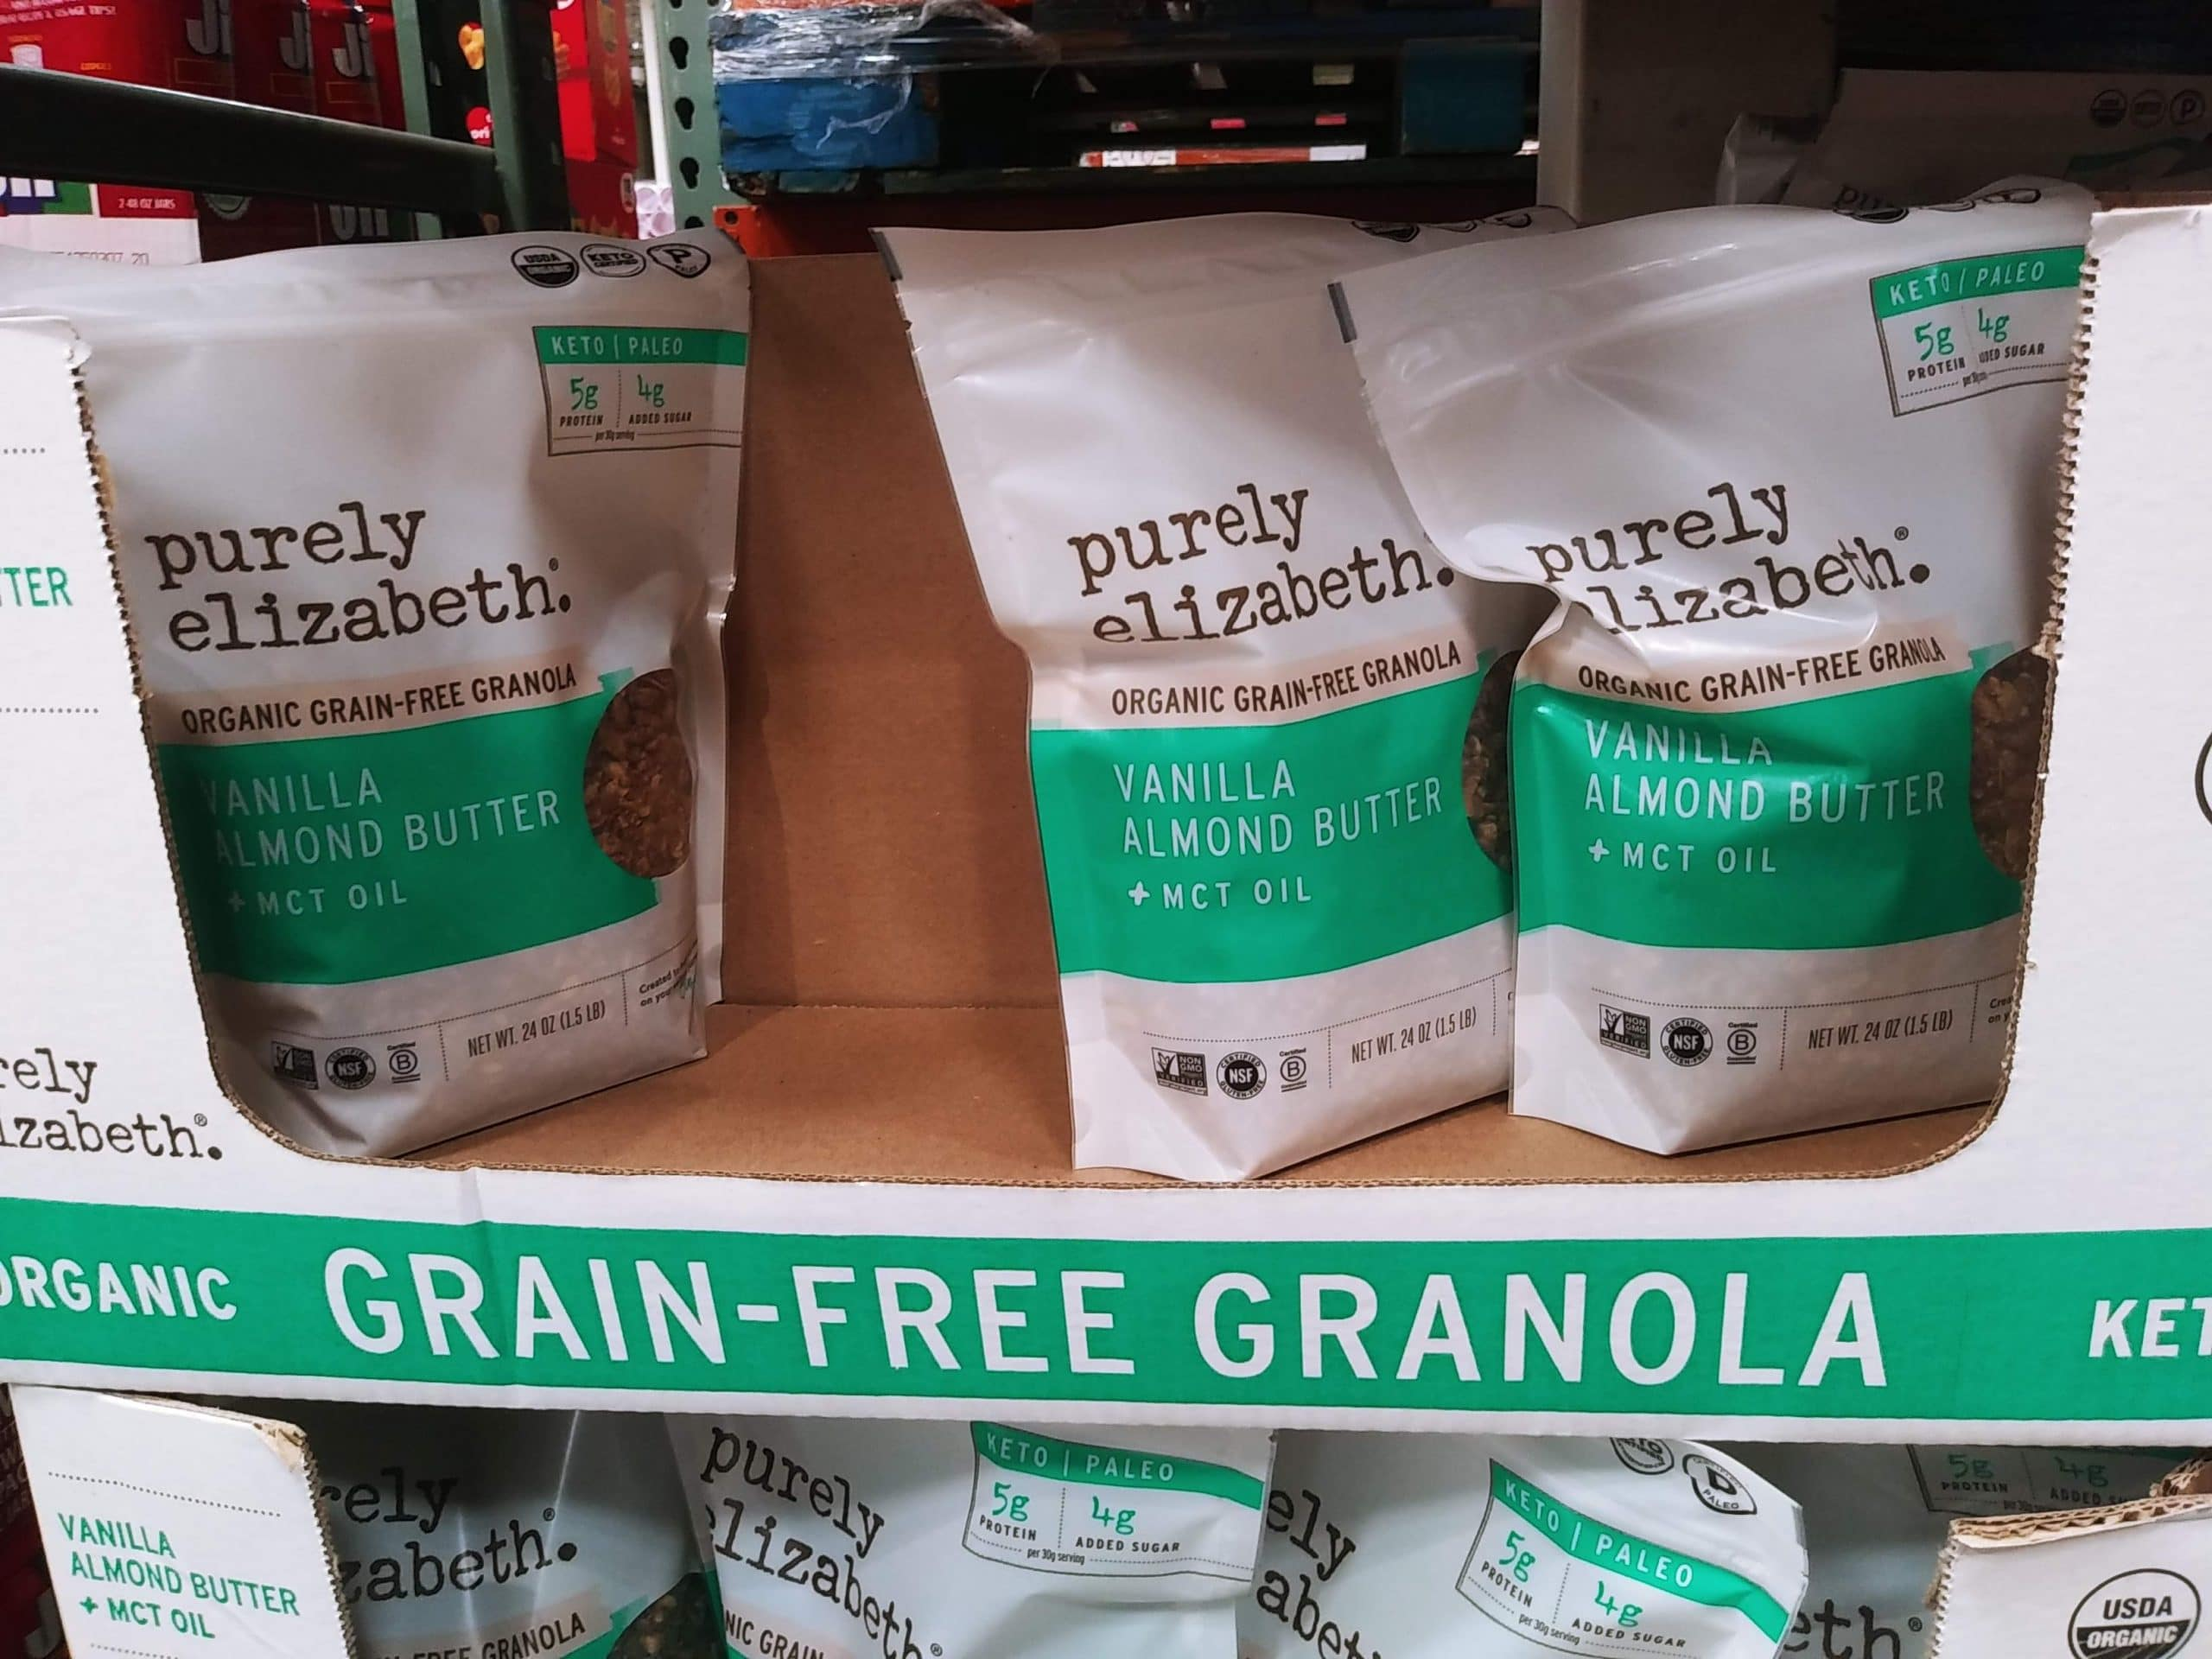 Organic Grain Free Granola 24oz $9.99